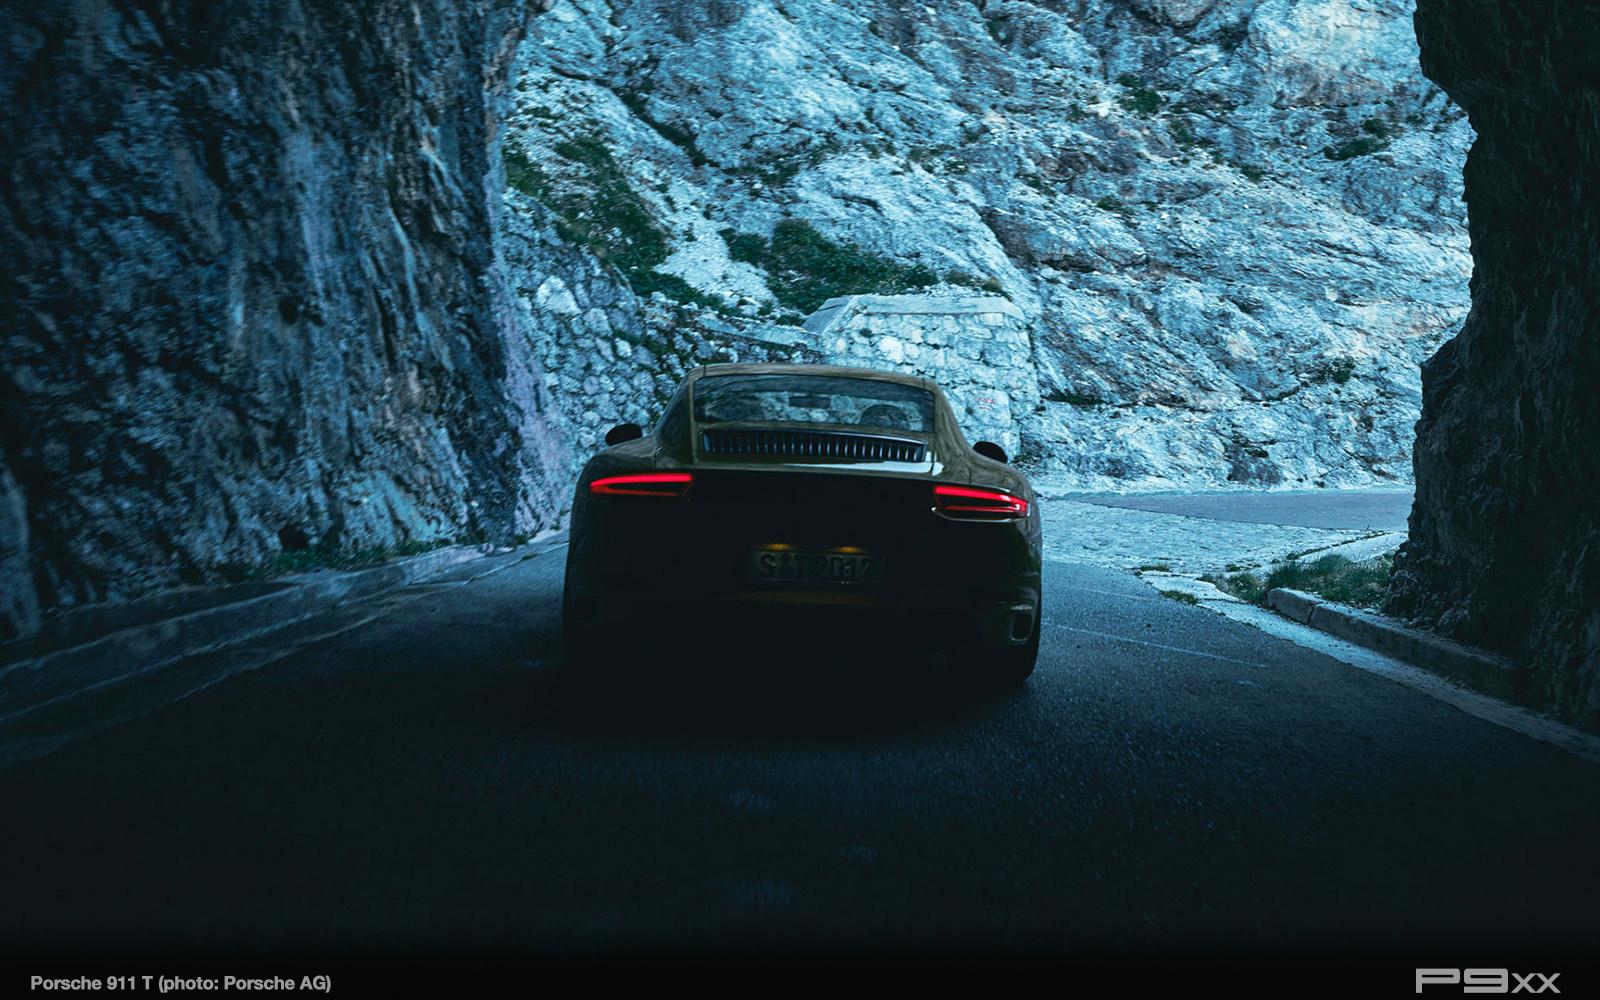 Porsche-911-Carrera-T-326